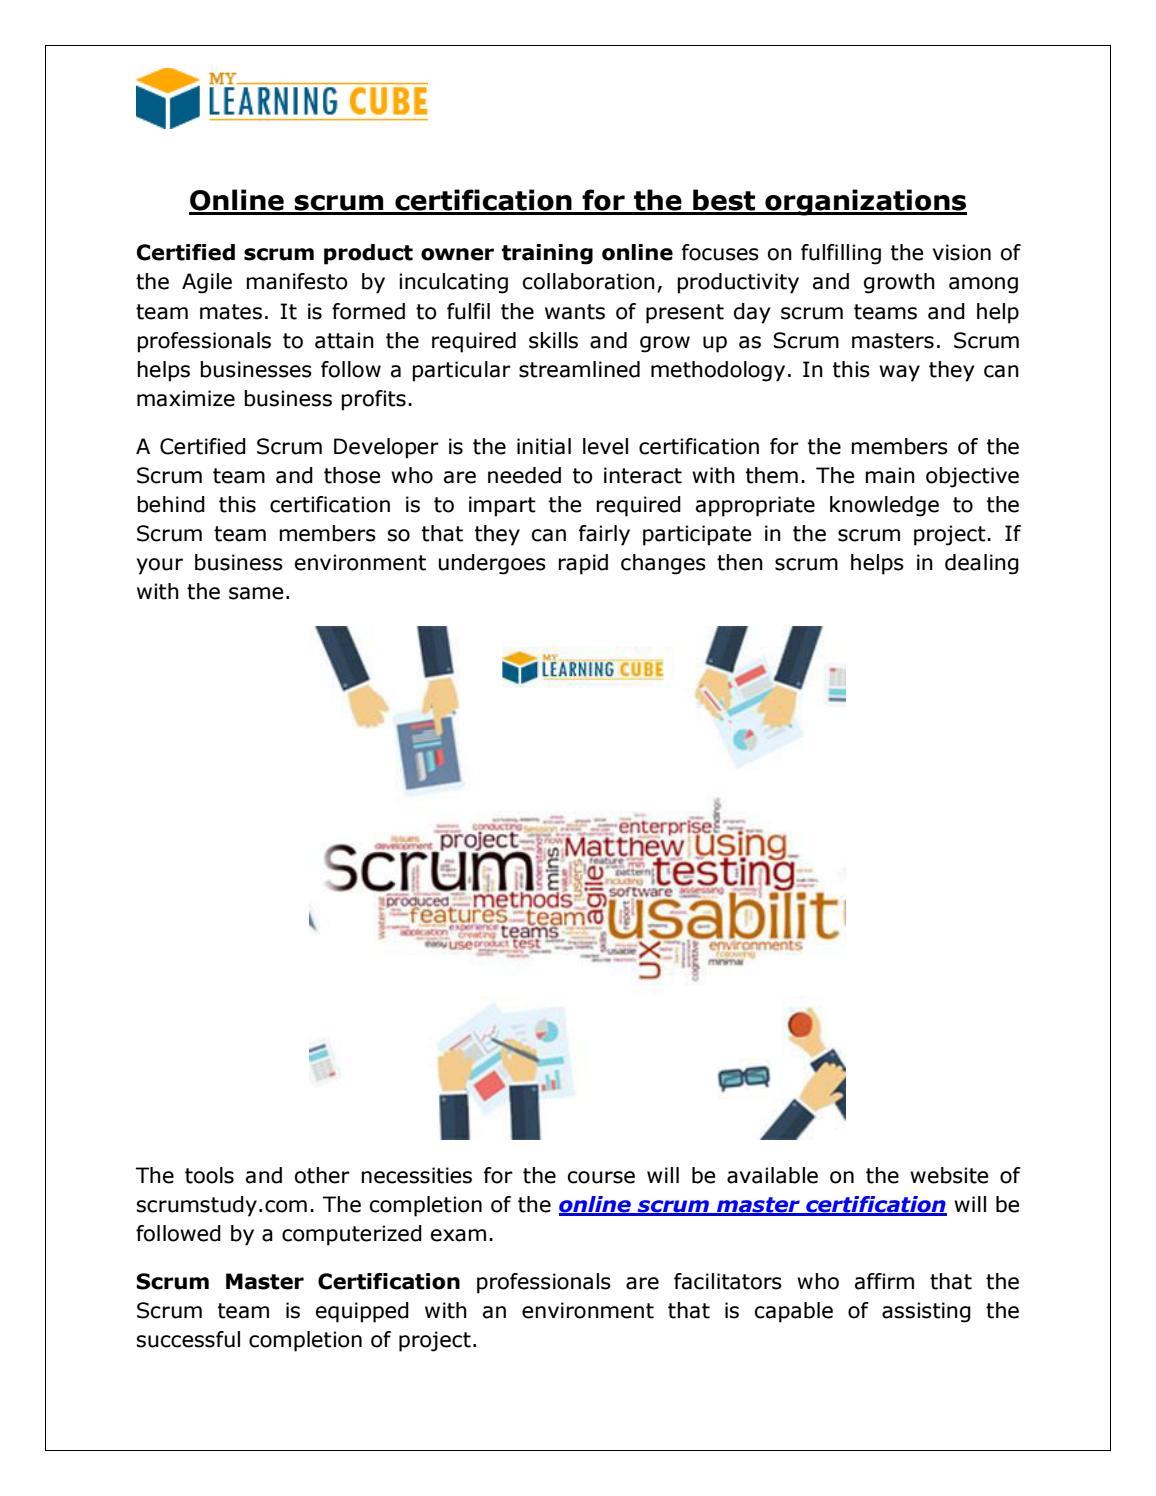 Scrum Master Certification Mylearningcube By Mylearningcube Issuu